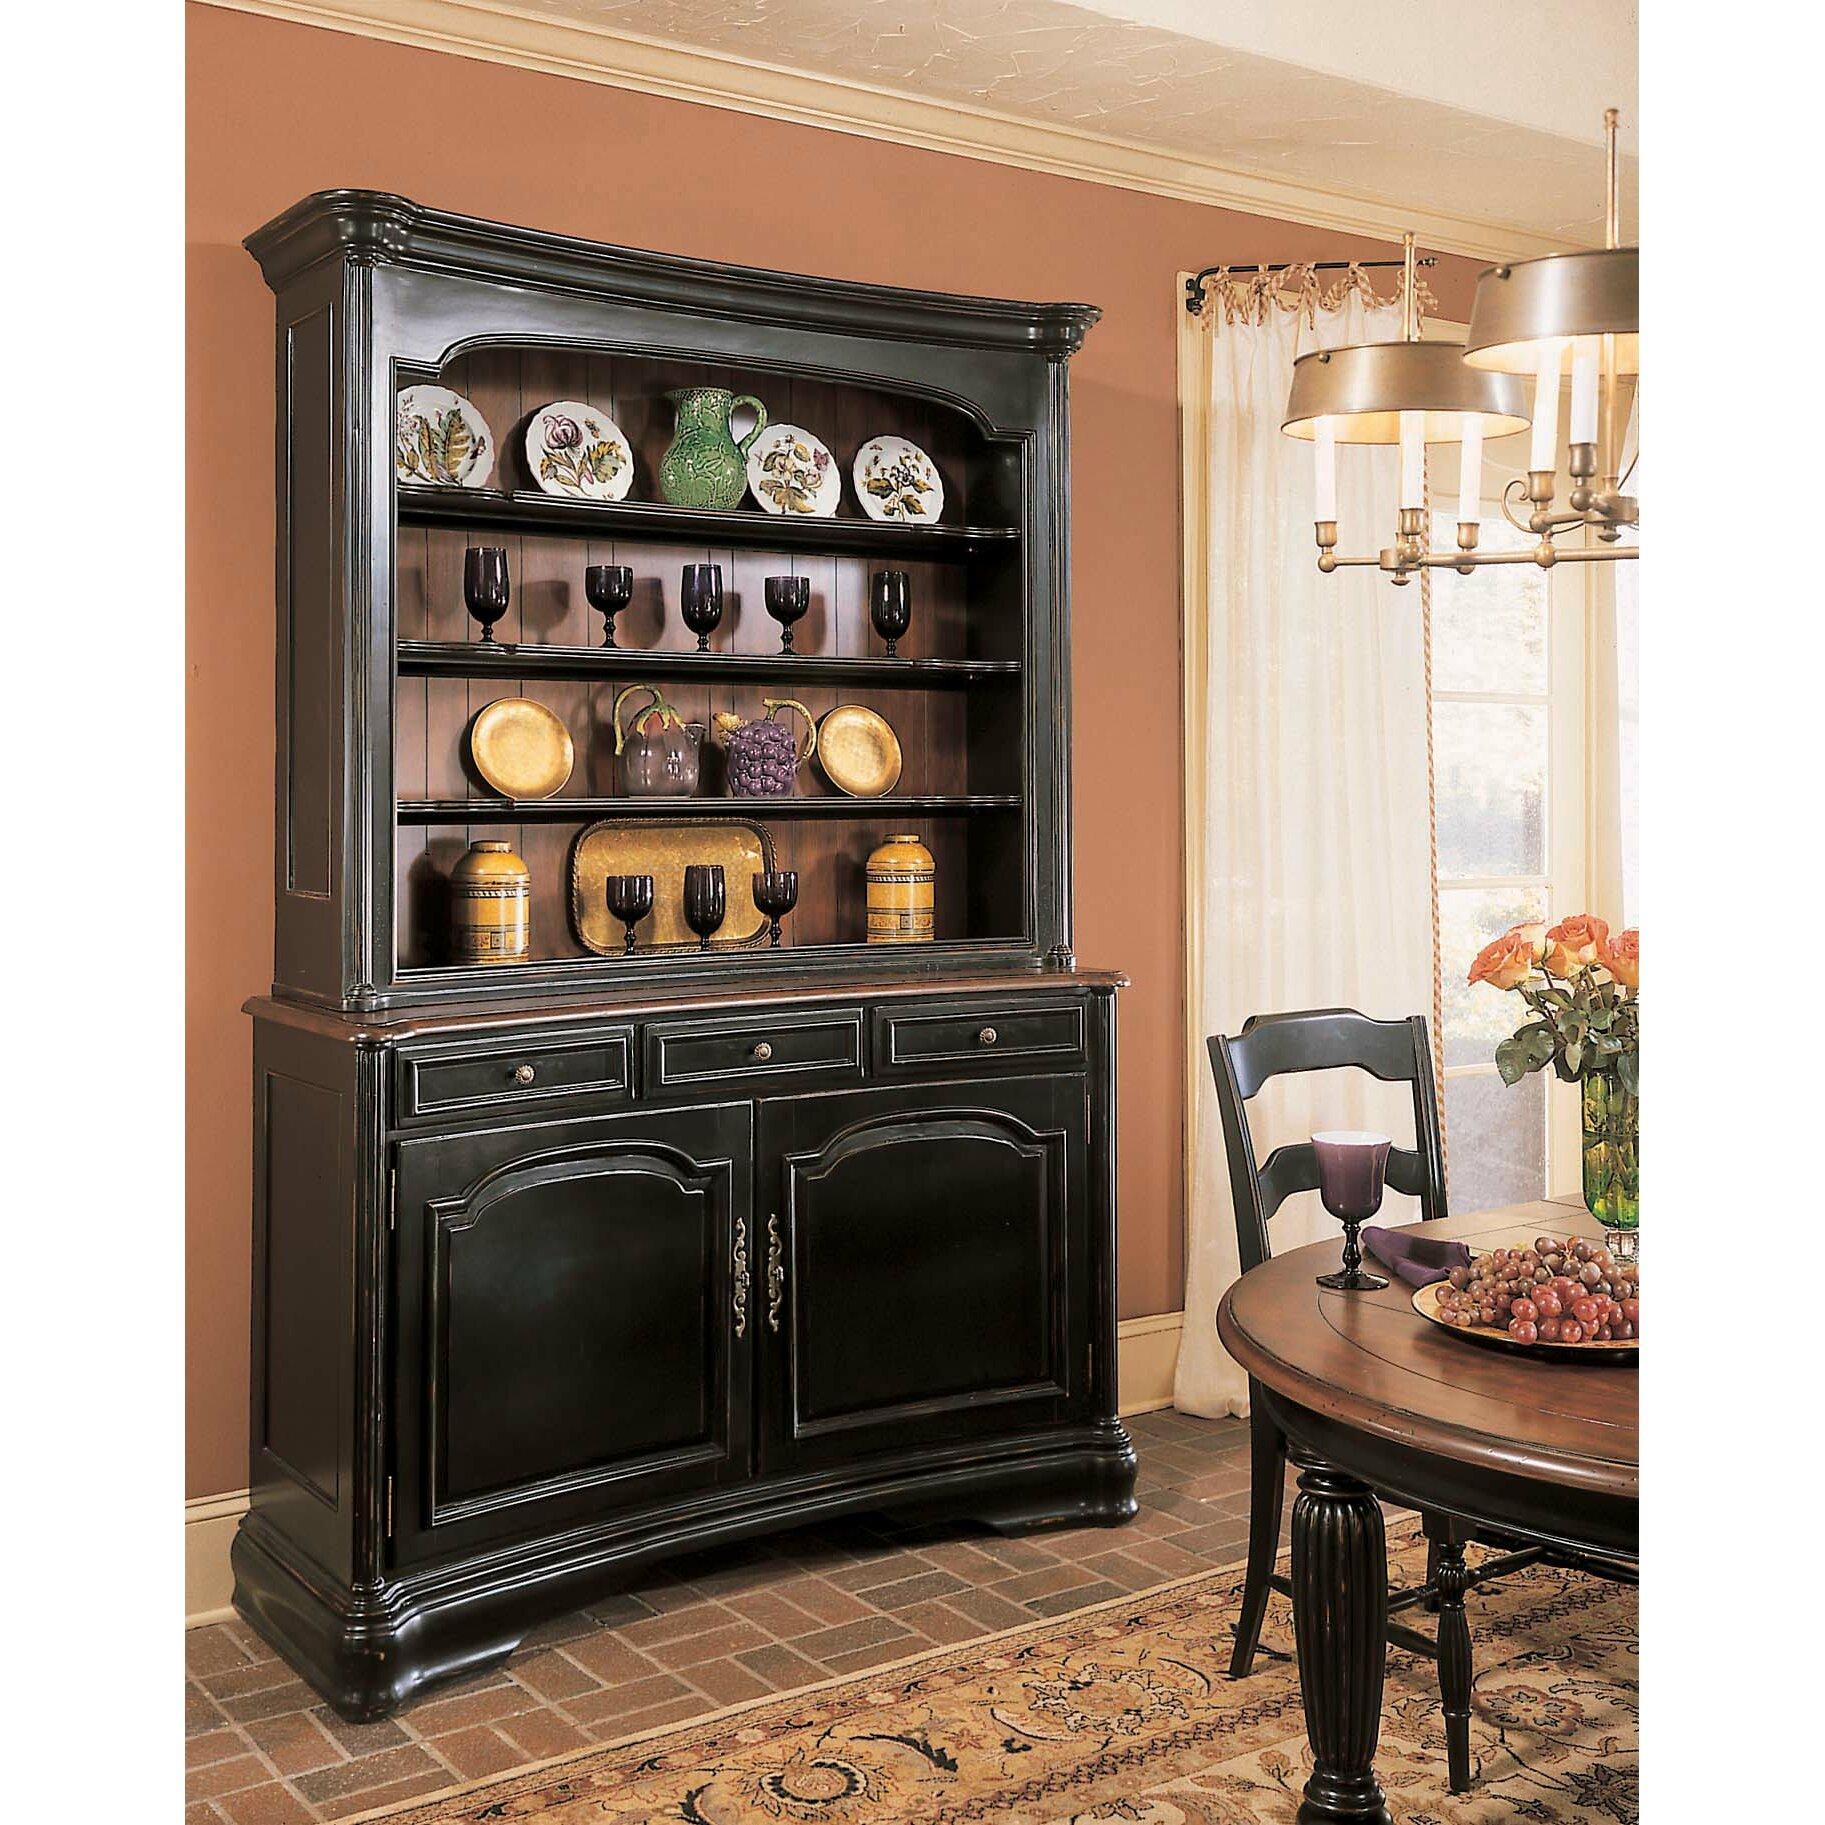 Hooker furniture indigo creek china cabinet base reviews for Indigo kitchen cabinets